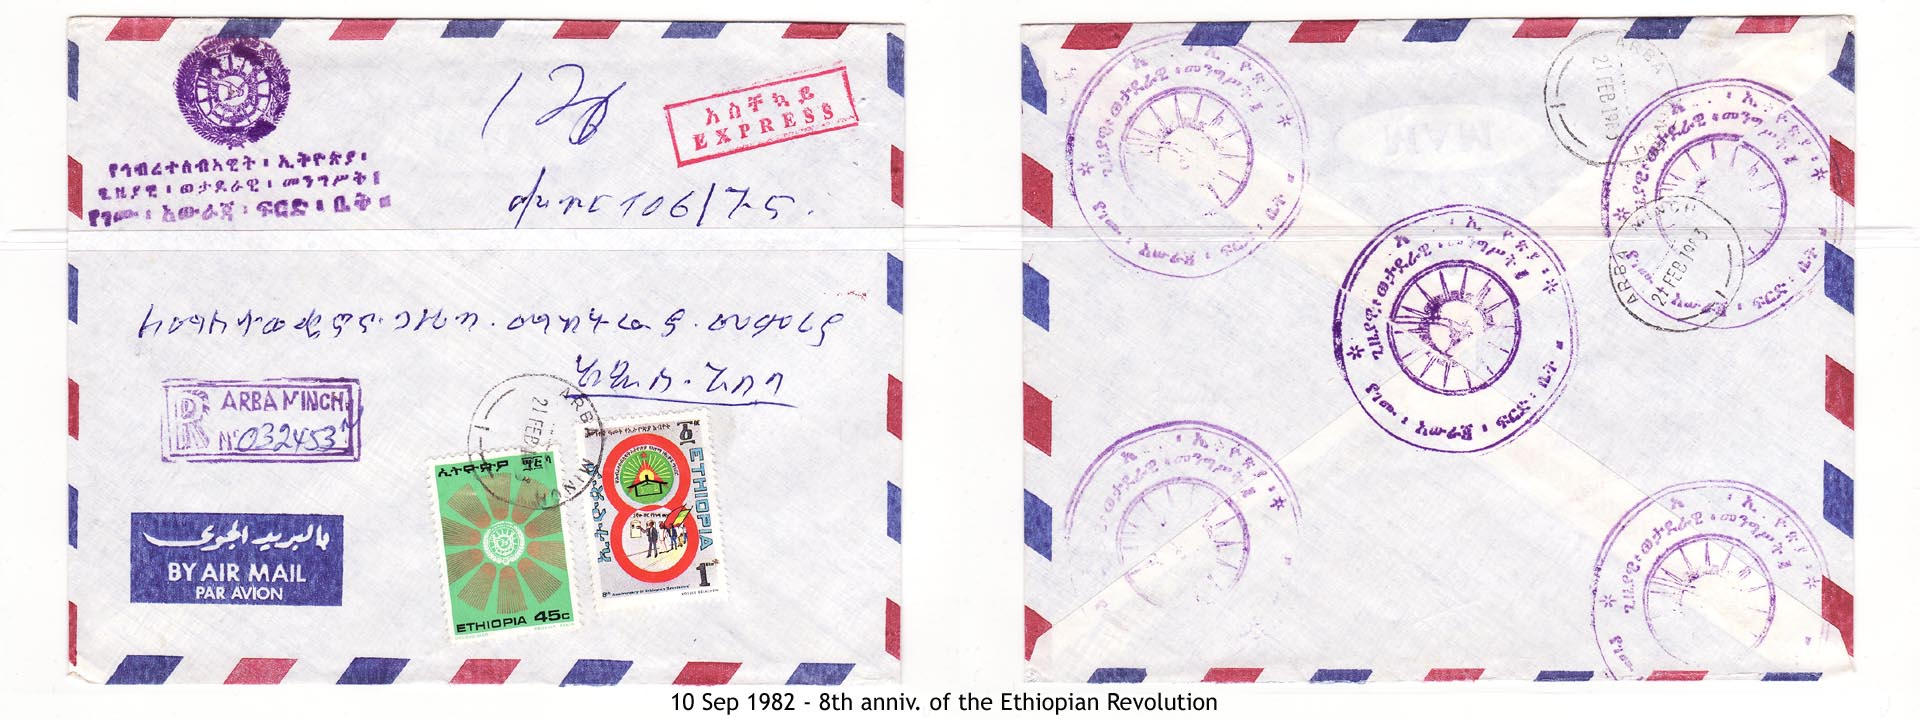 19820910 - 8th anniv. of the Ethiopian Revolution